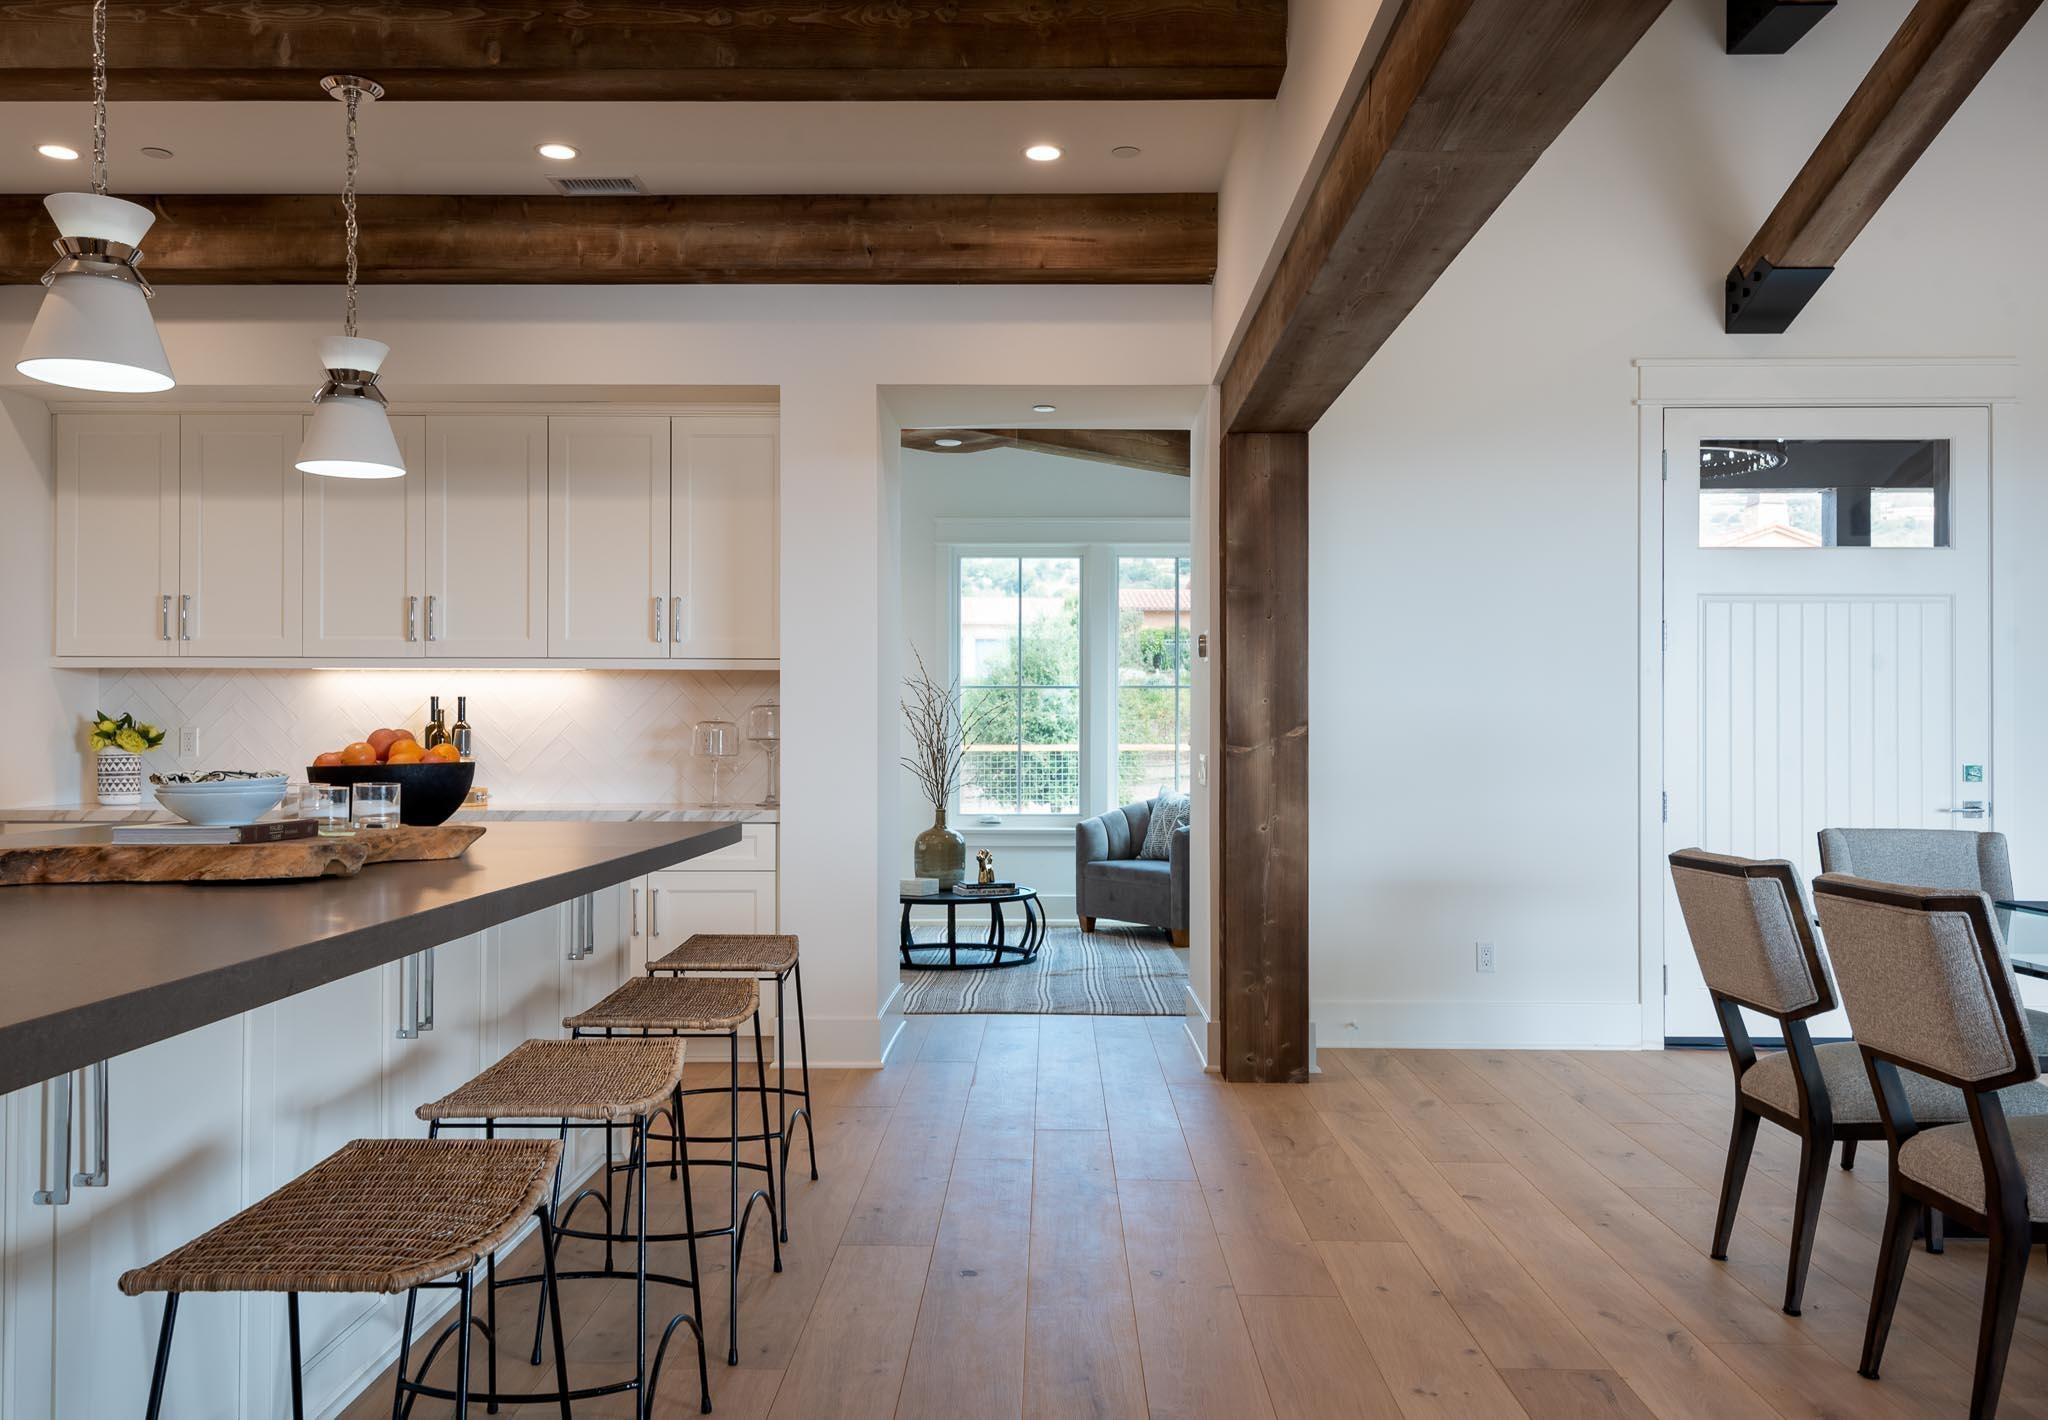 Inspiration Photos - Dining Kitchen Area